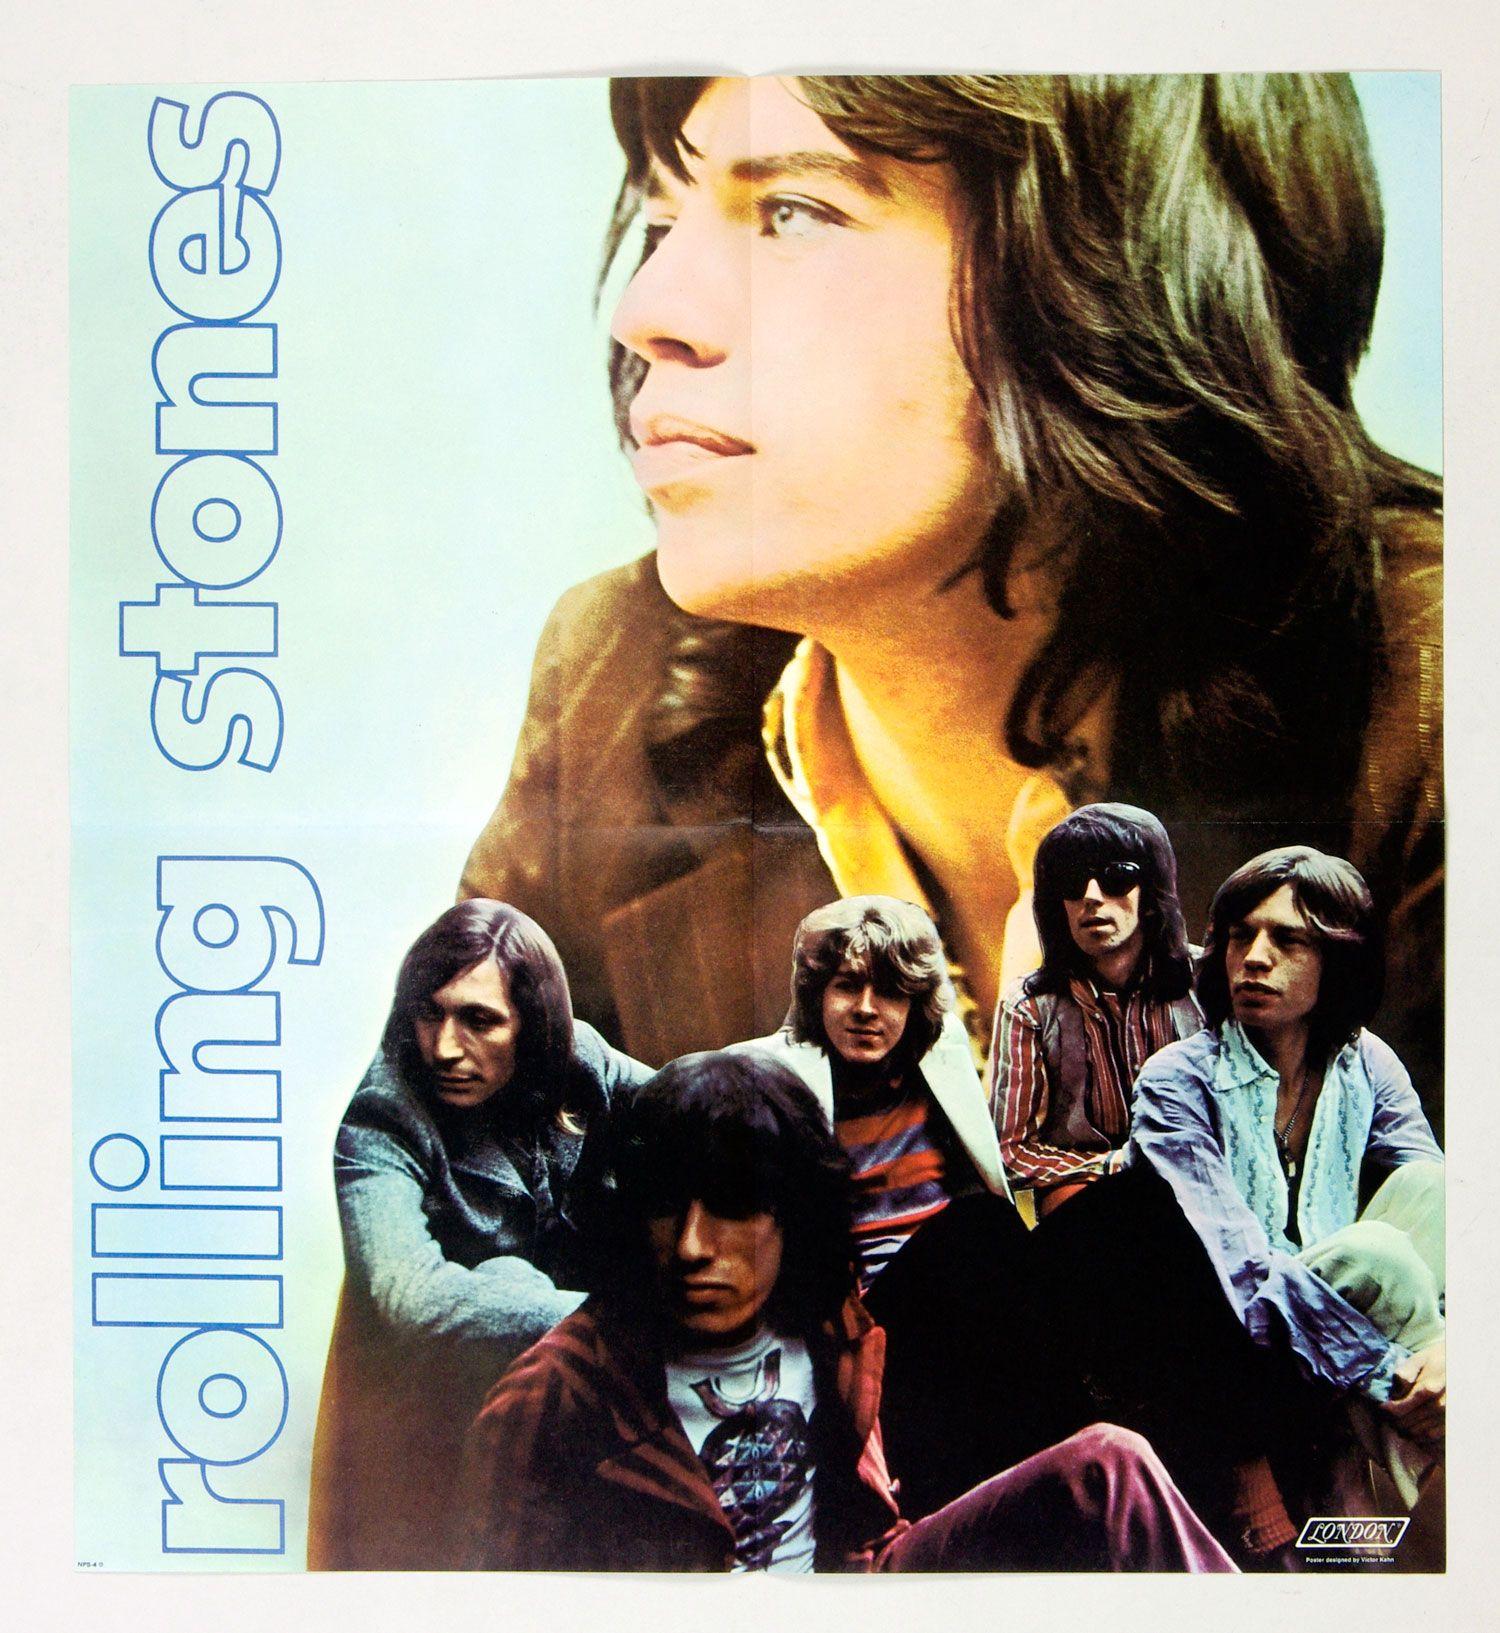 The Rolling Stones Poster 1969 Let It Bleed Album Promo 21 X 23 Rolling Stones Poster Rolling Stones Rolling Stones Album Covers